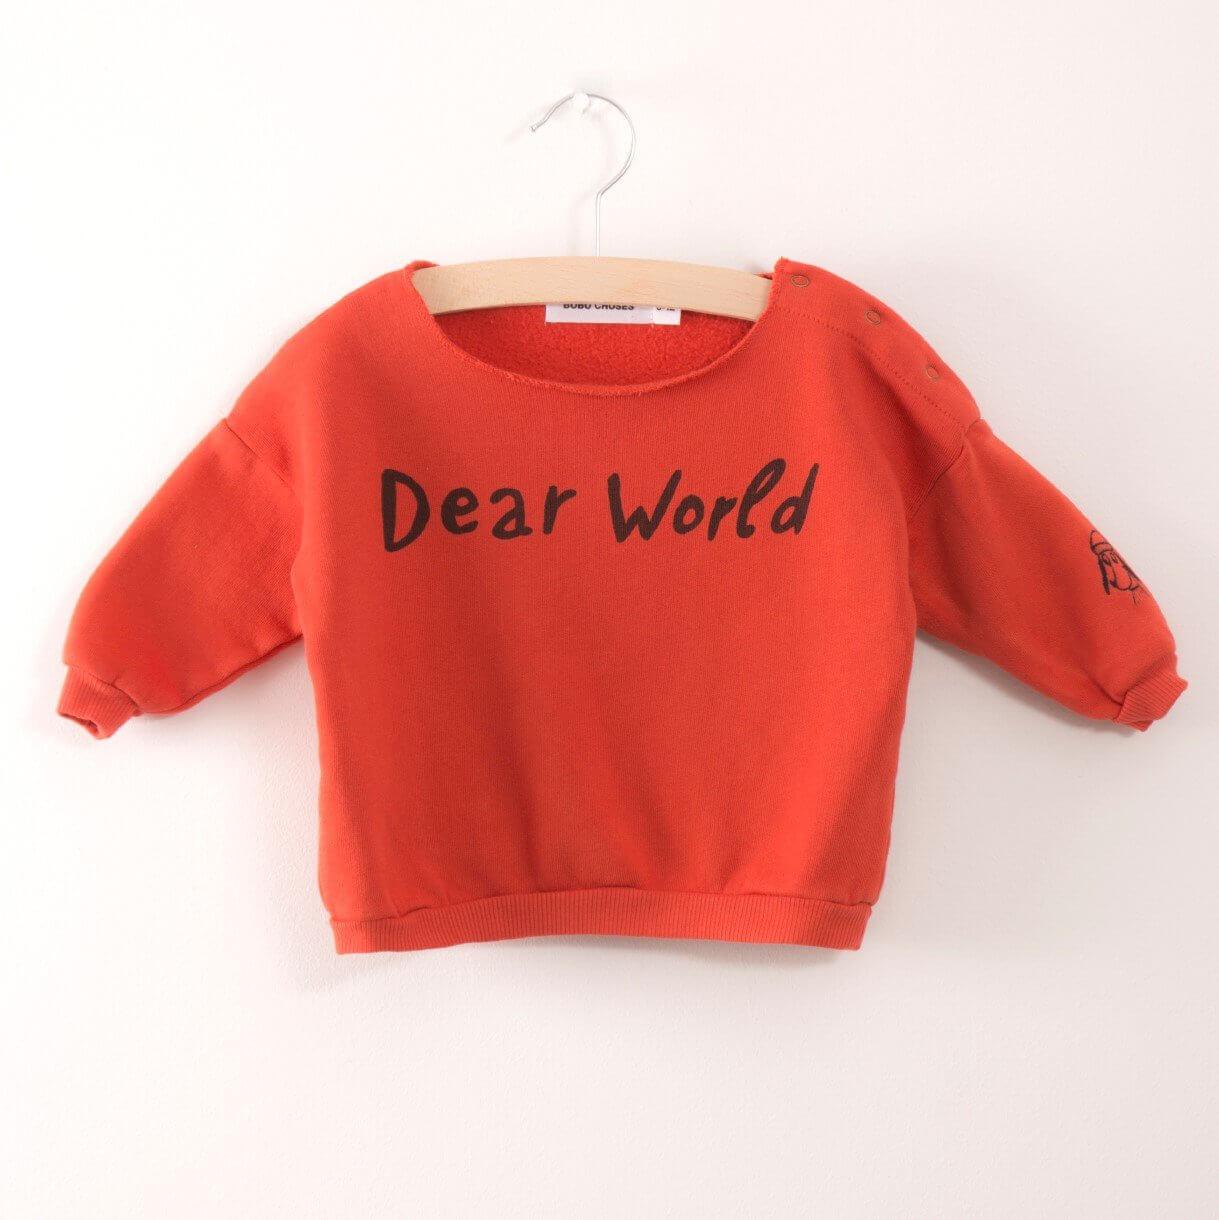 BOBO CHOSES Baby Sweashirt Dear world aus Biobaumwolle